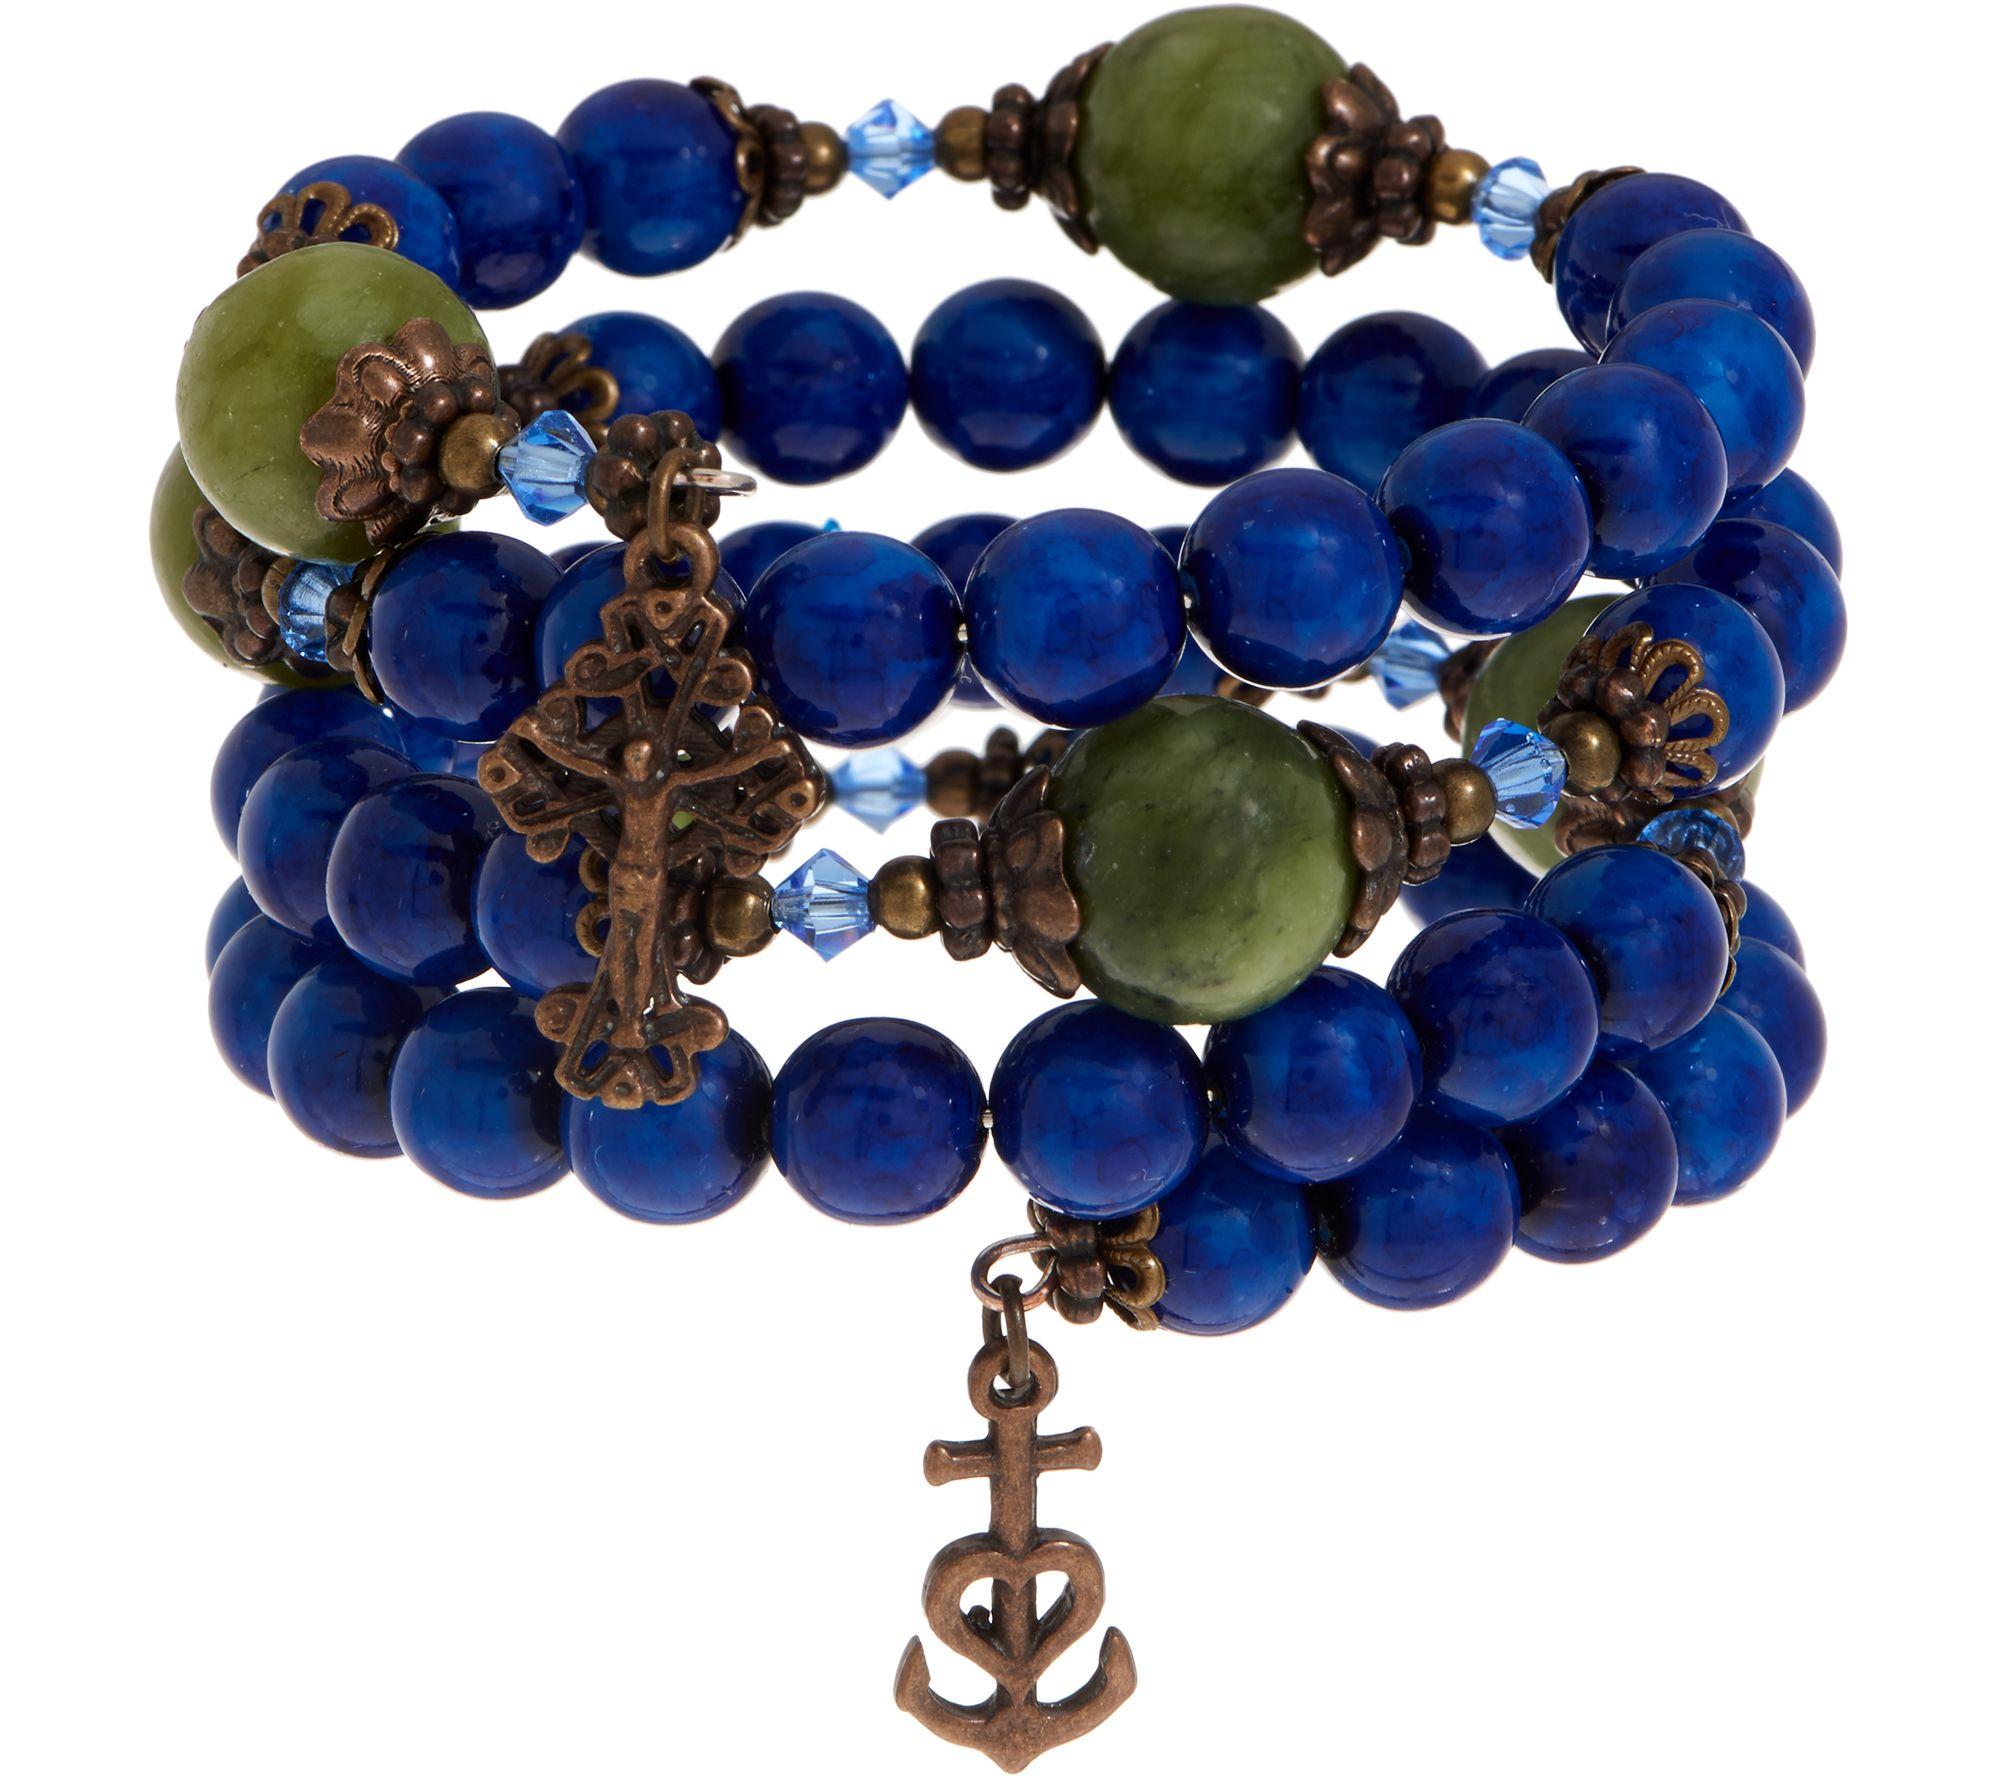 Connemara Marble Coil Rosary Bracelet Page 1 Qvc Com